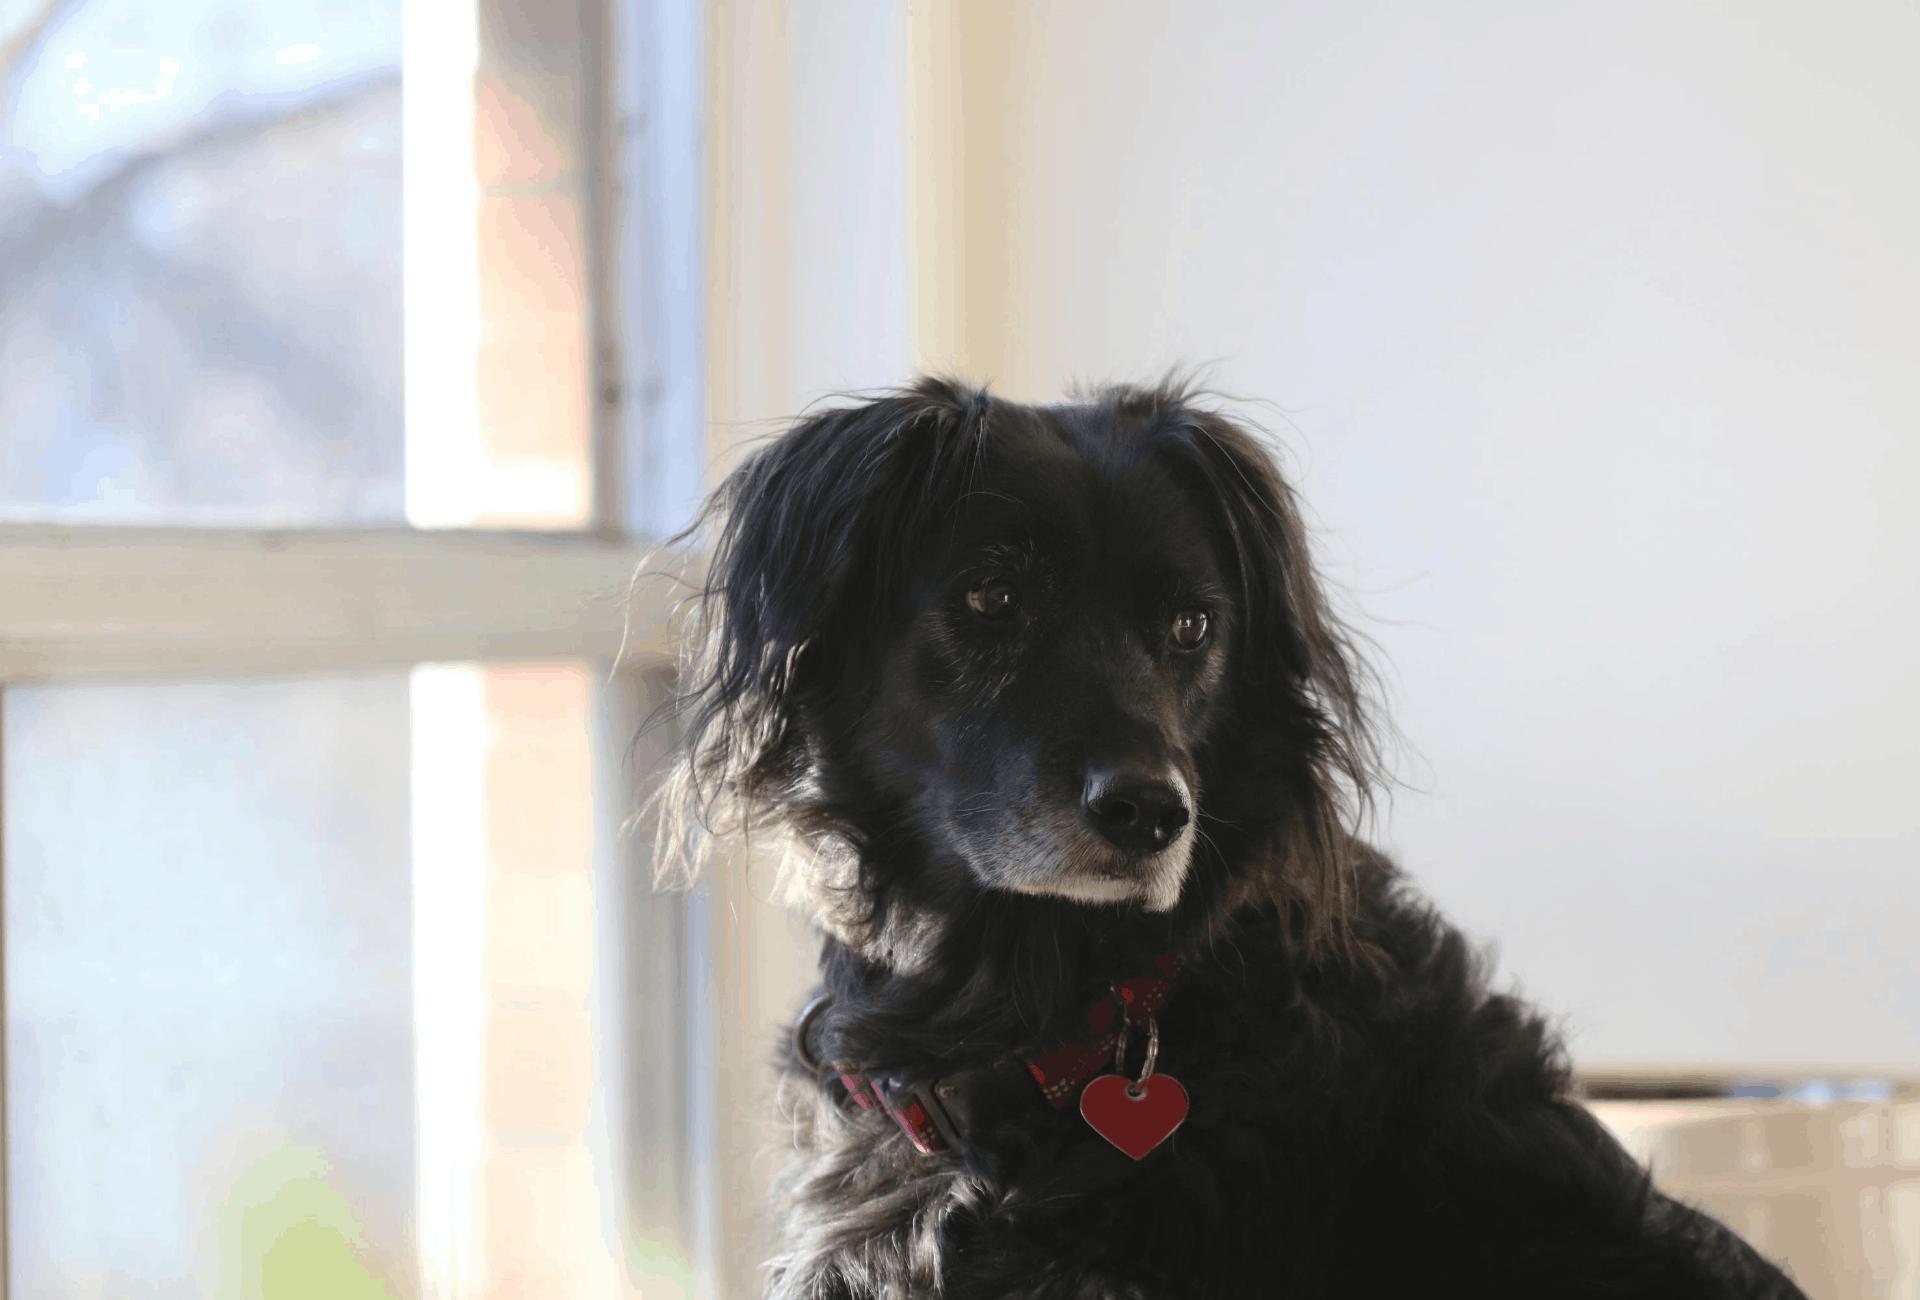 Black senior dog with white nose.